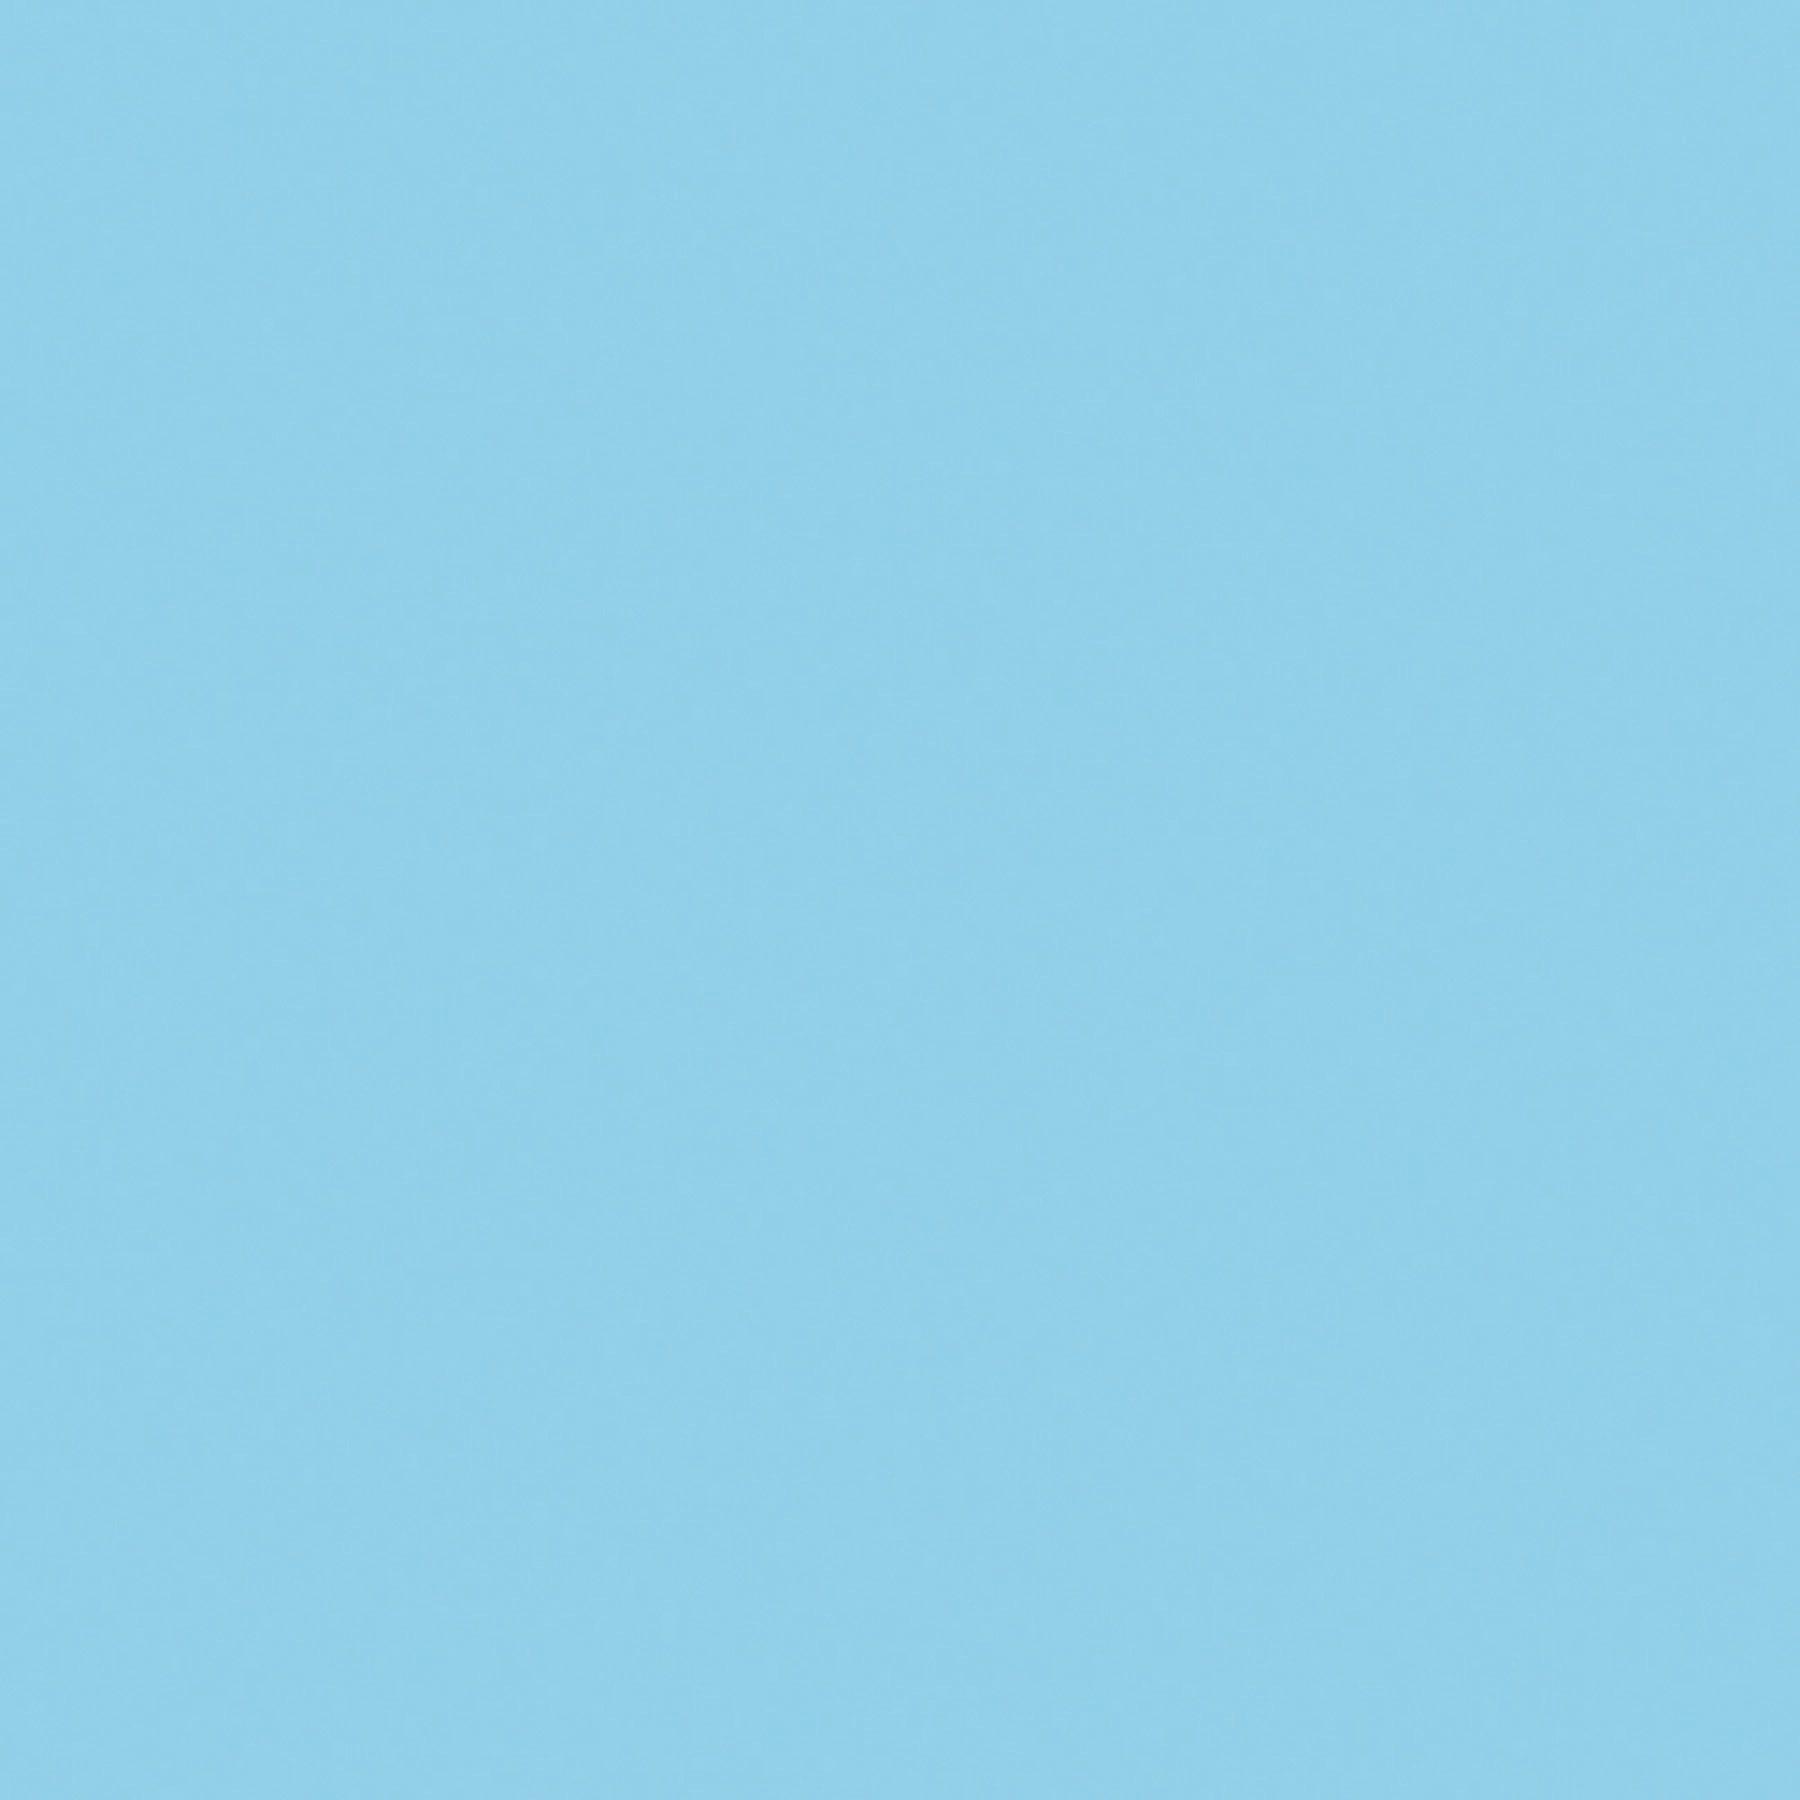 Gloss Baby Blue by Krylon